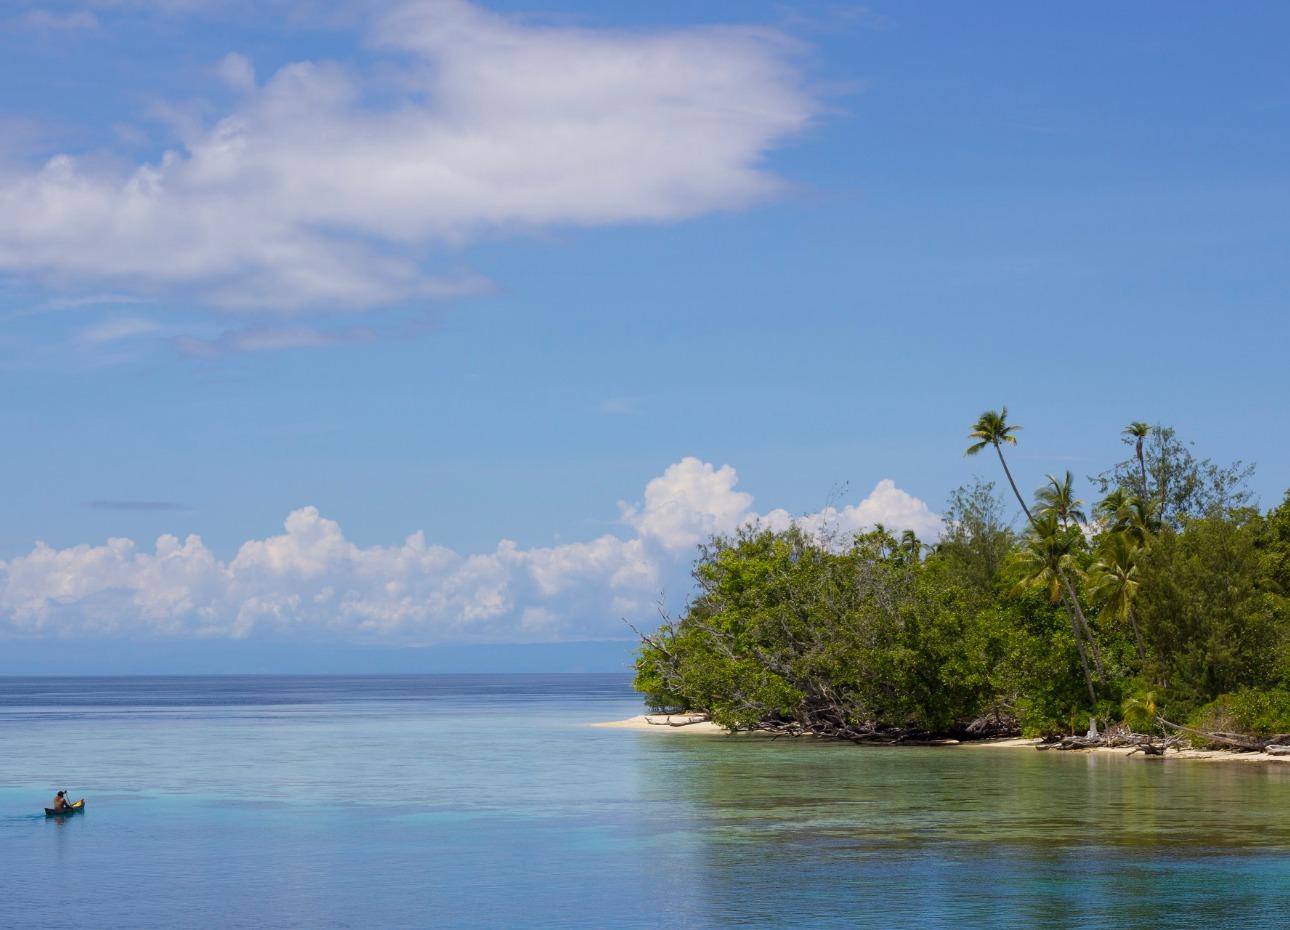 Solomon Islands, Edge of Island, image